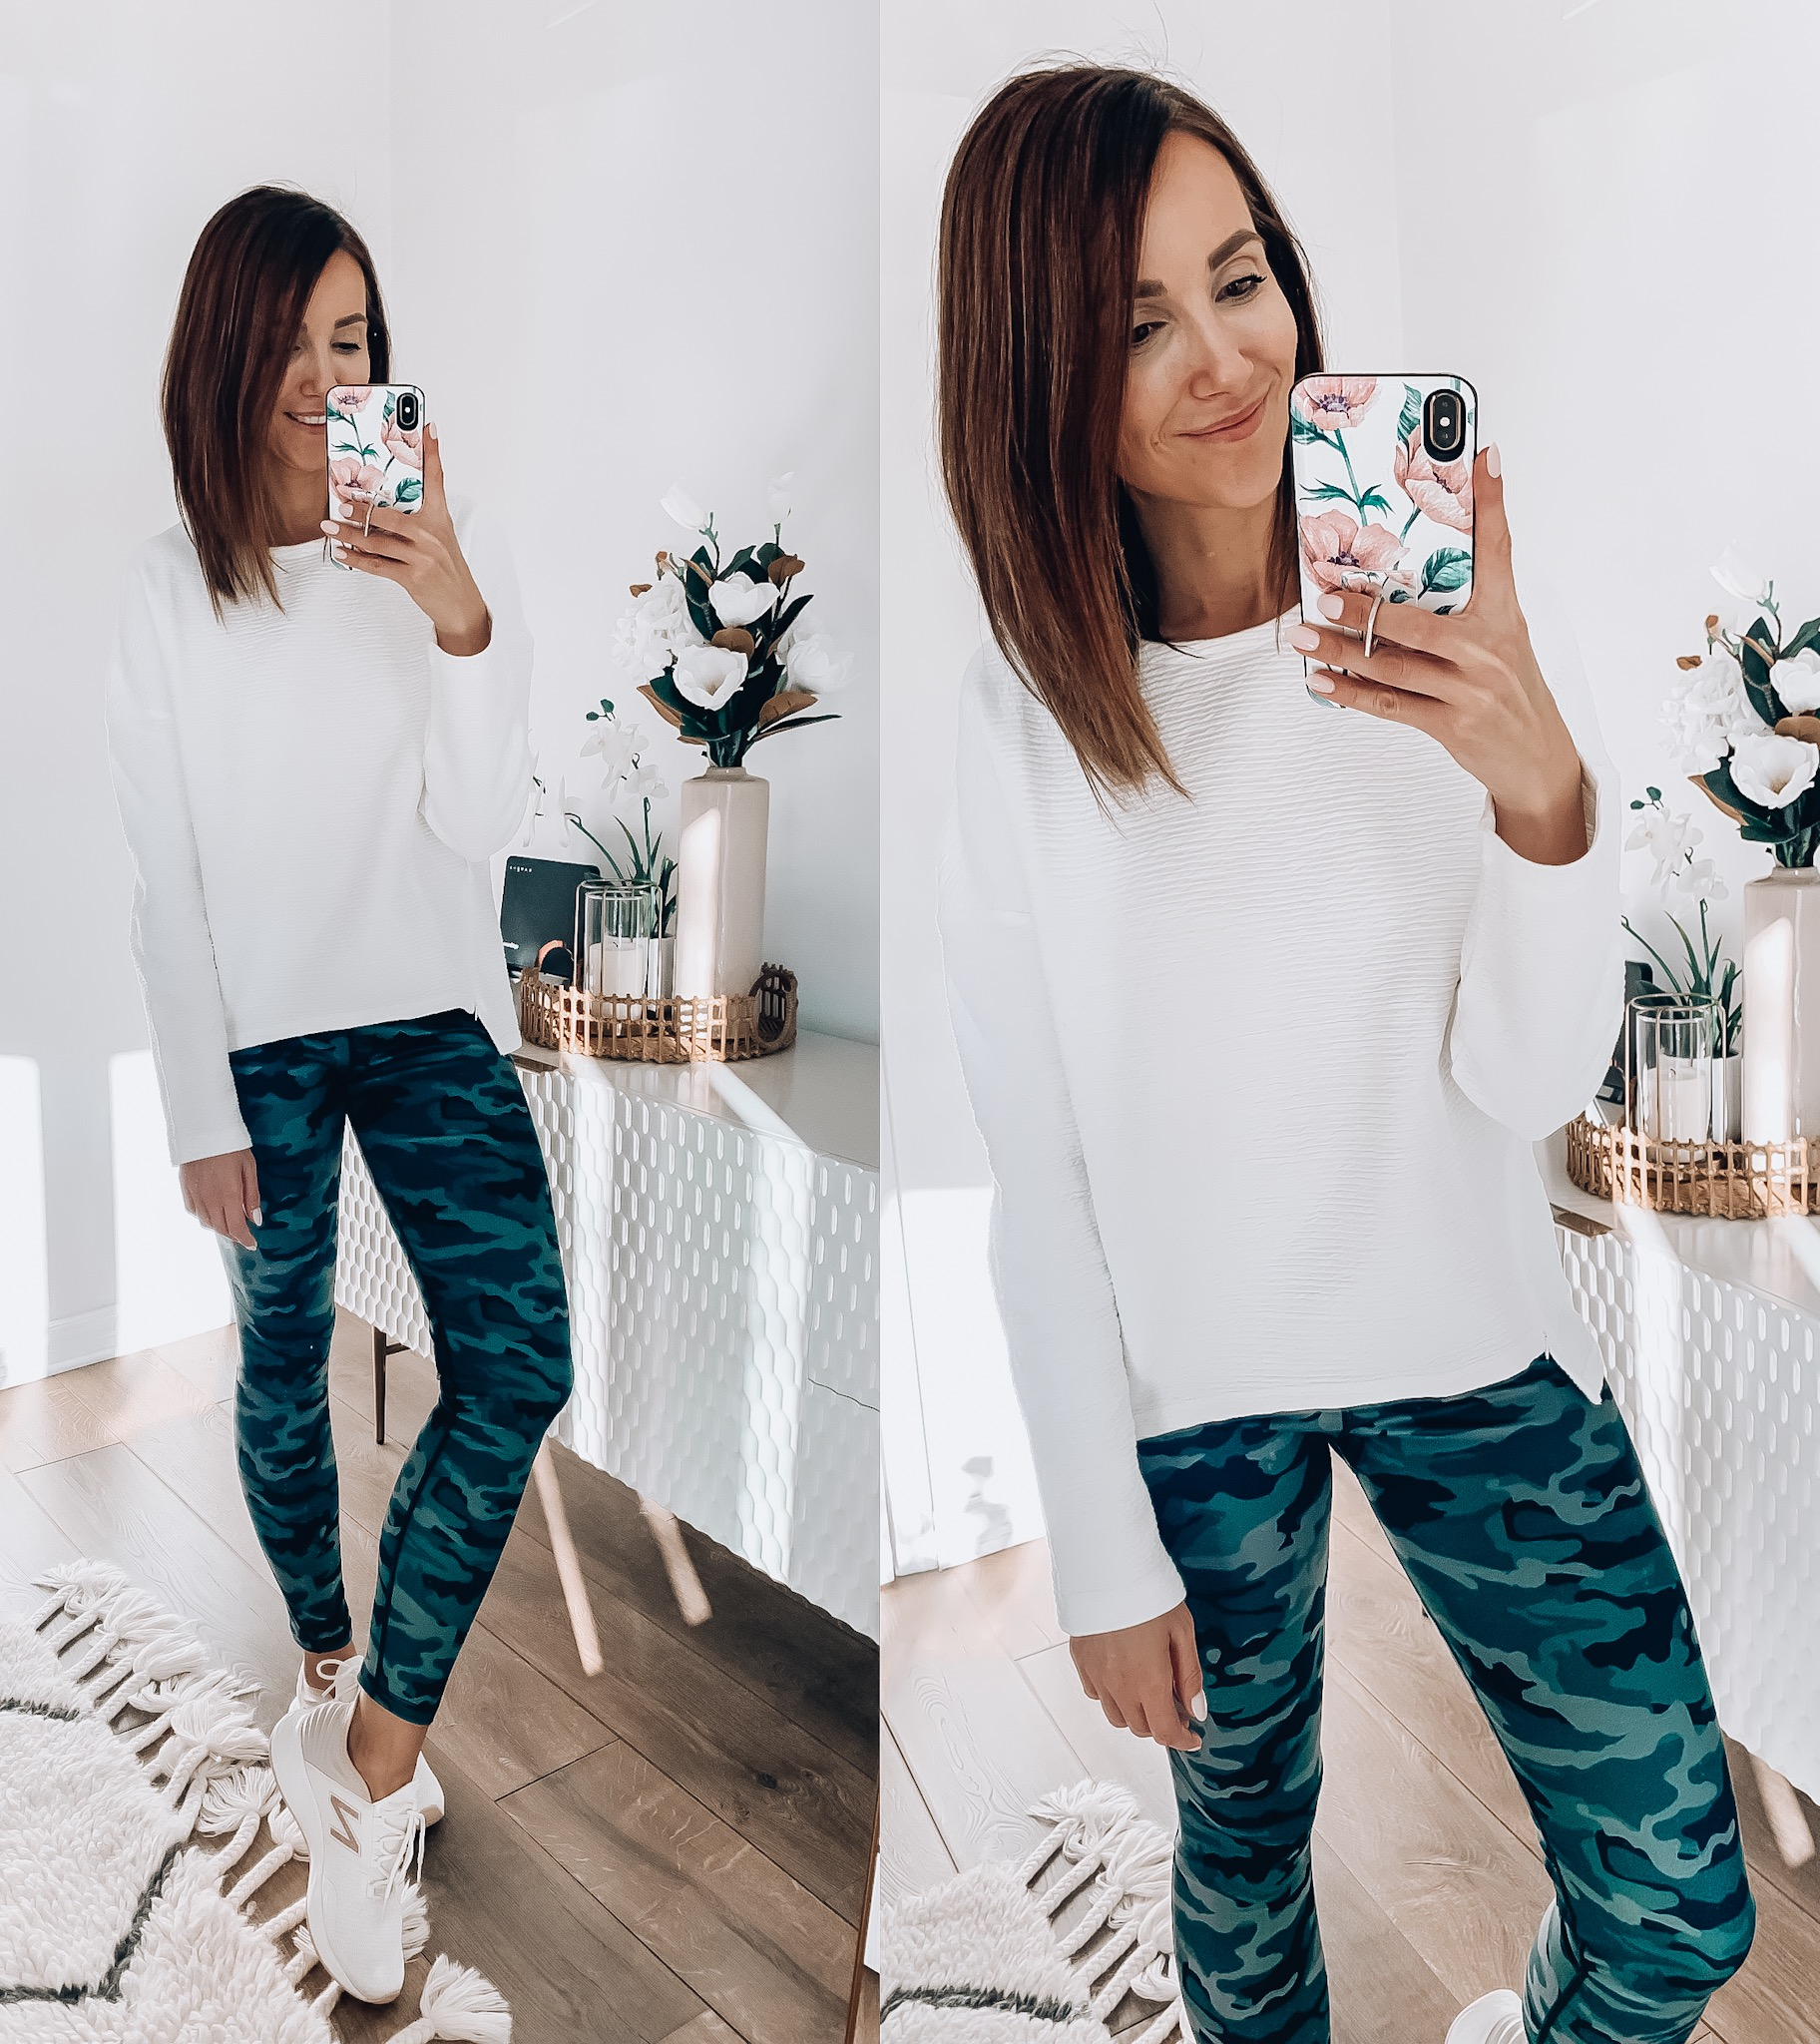 woman wearing athleisure wear, camo leggings, white sweatshirt